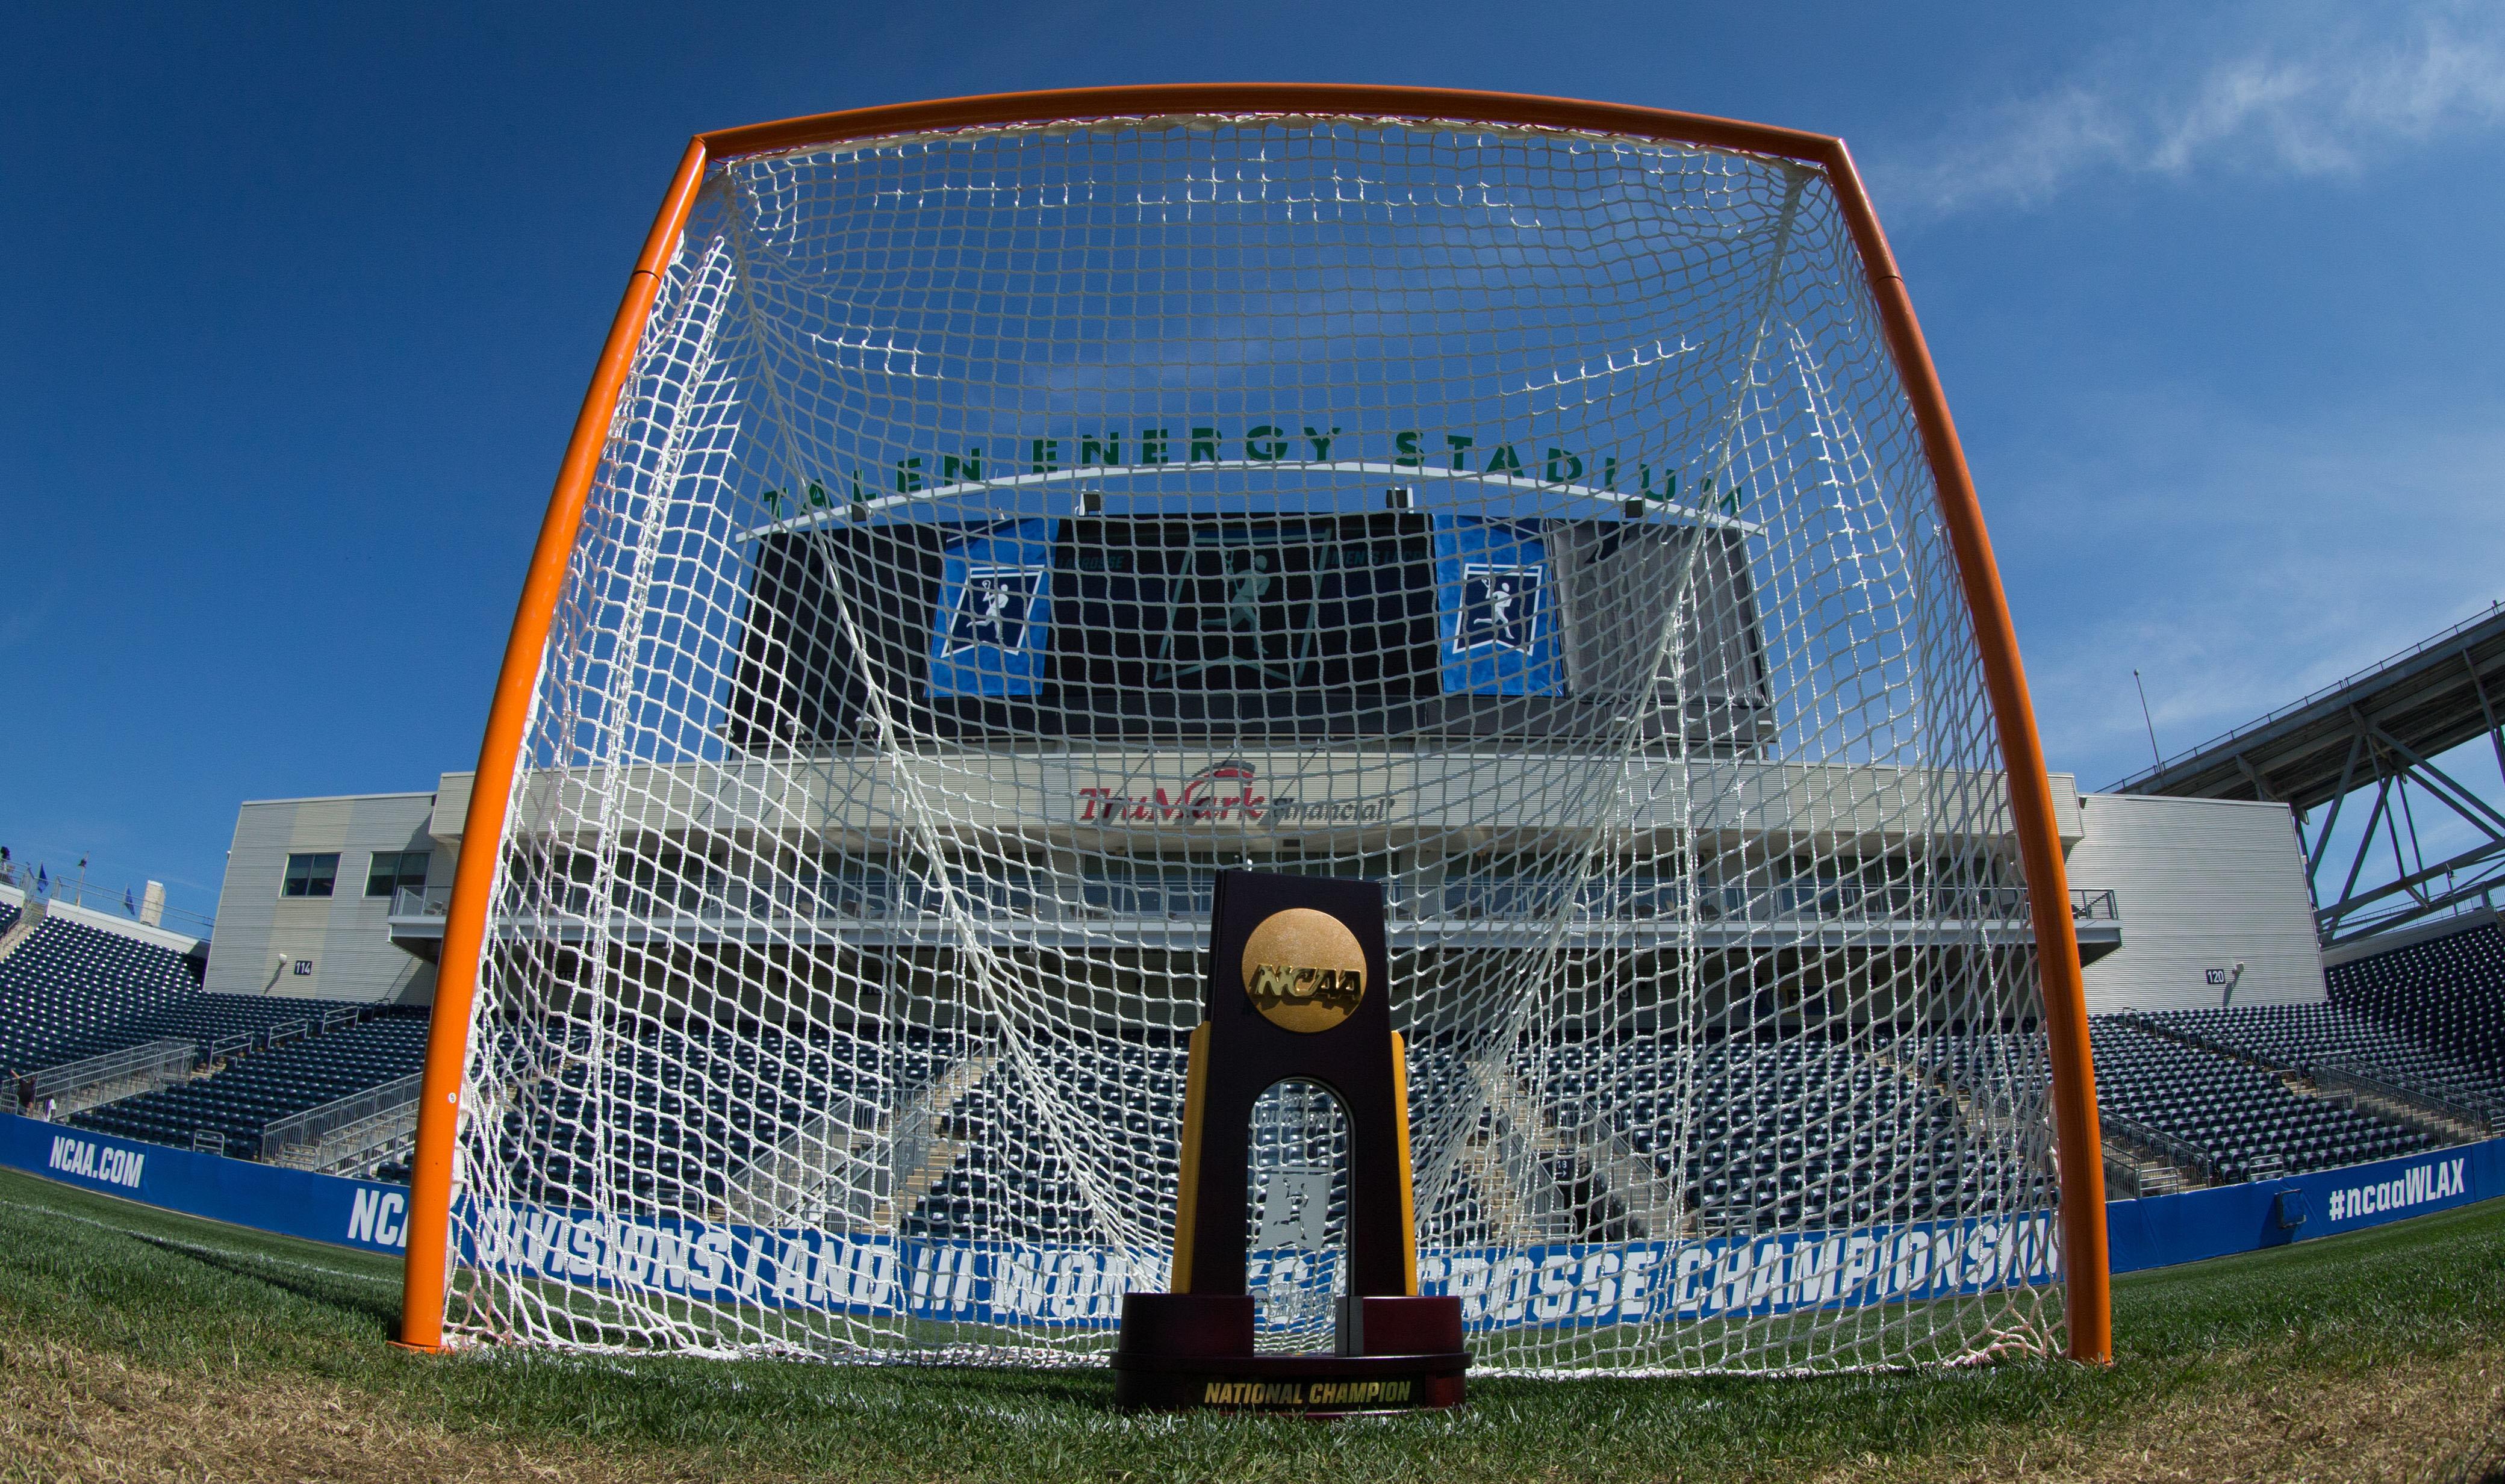 9315012-ncaa-womens-lacrosse-national-championship